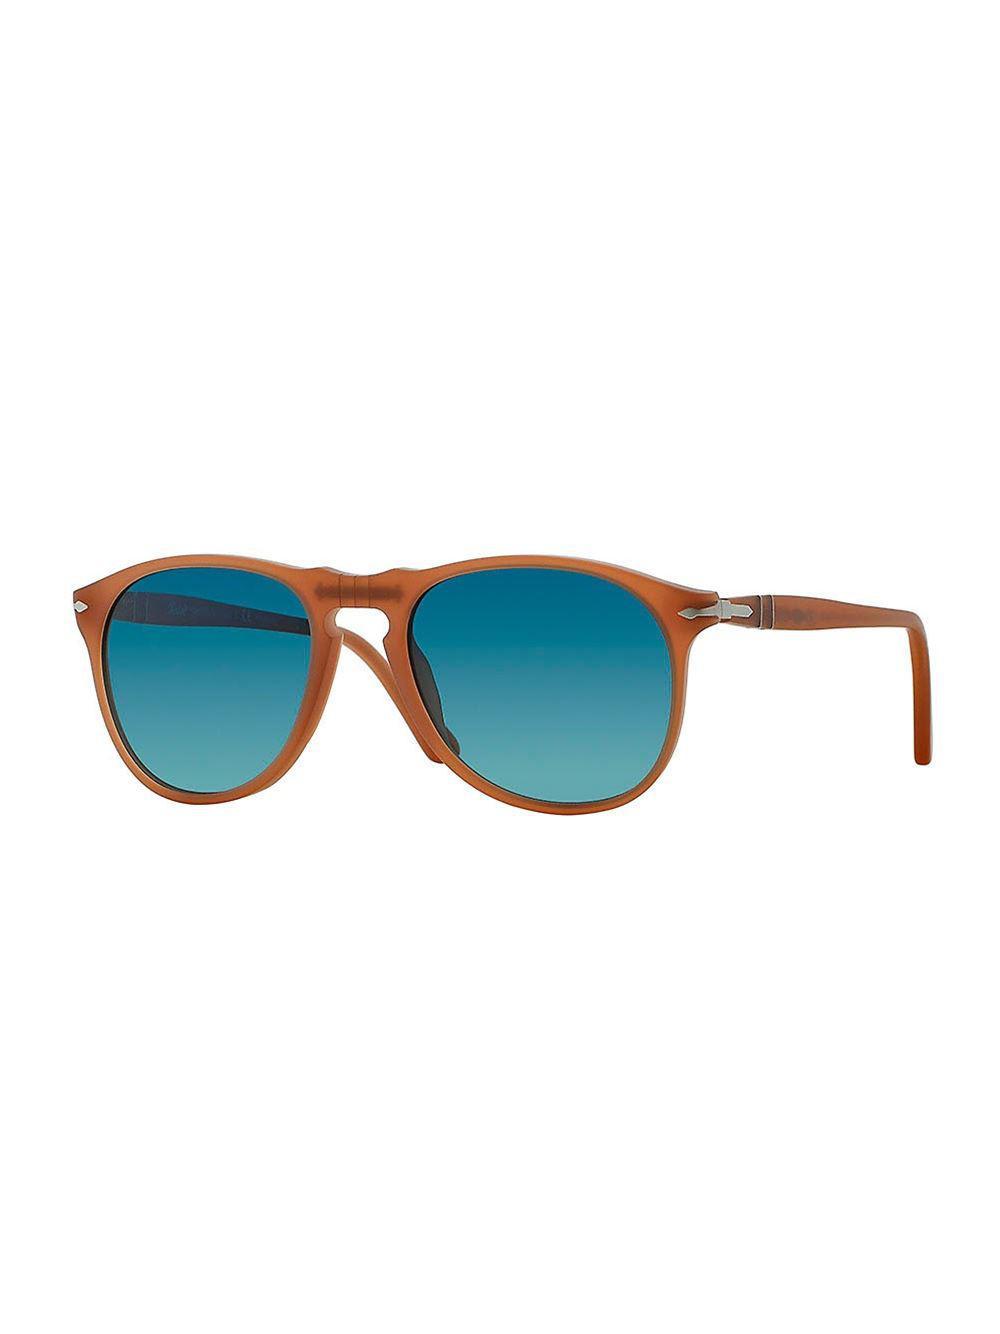 ca9dc3423 Oculos De Sol Champion Eyewear – Southern California Weather Force